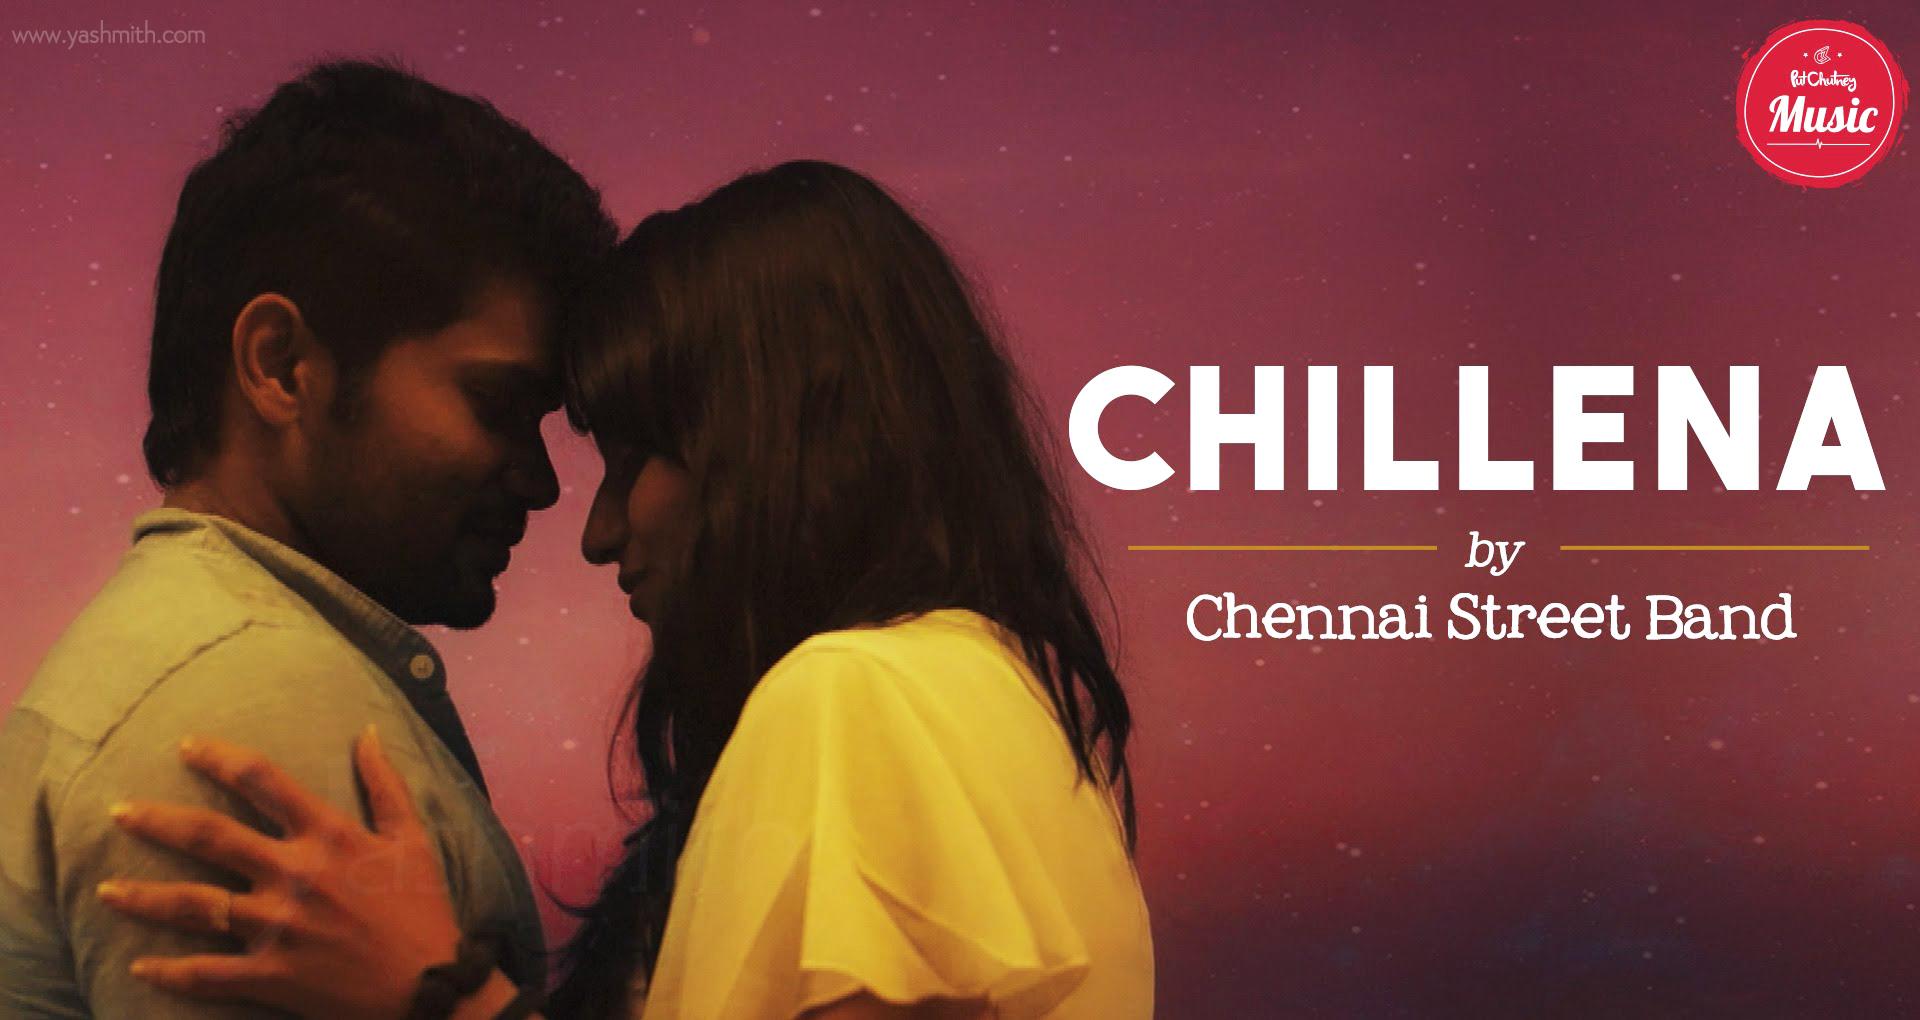 Chillena Oru Mazhai Thuli Cover Song By Chennai Street Band | Yashmith